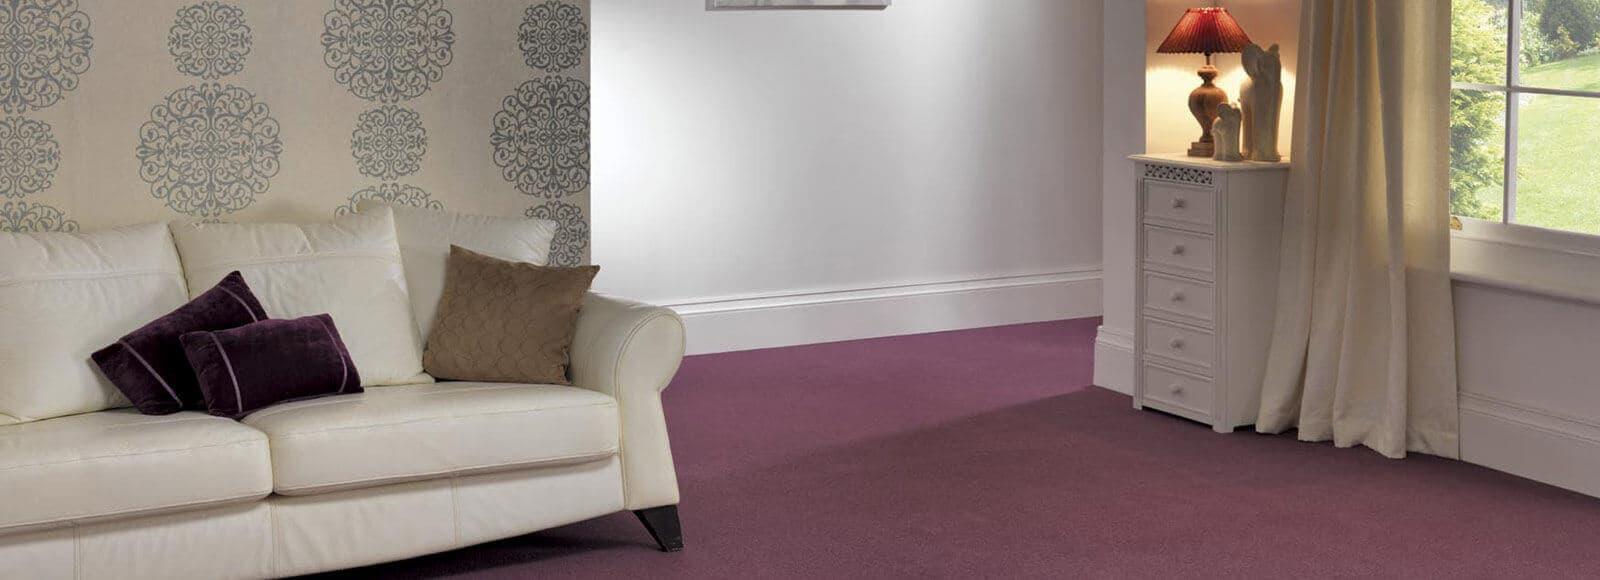 Cavalier Purple Carpet